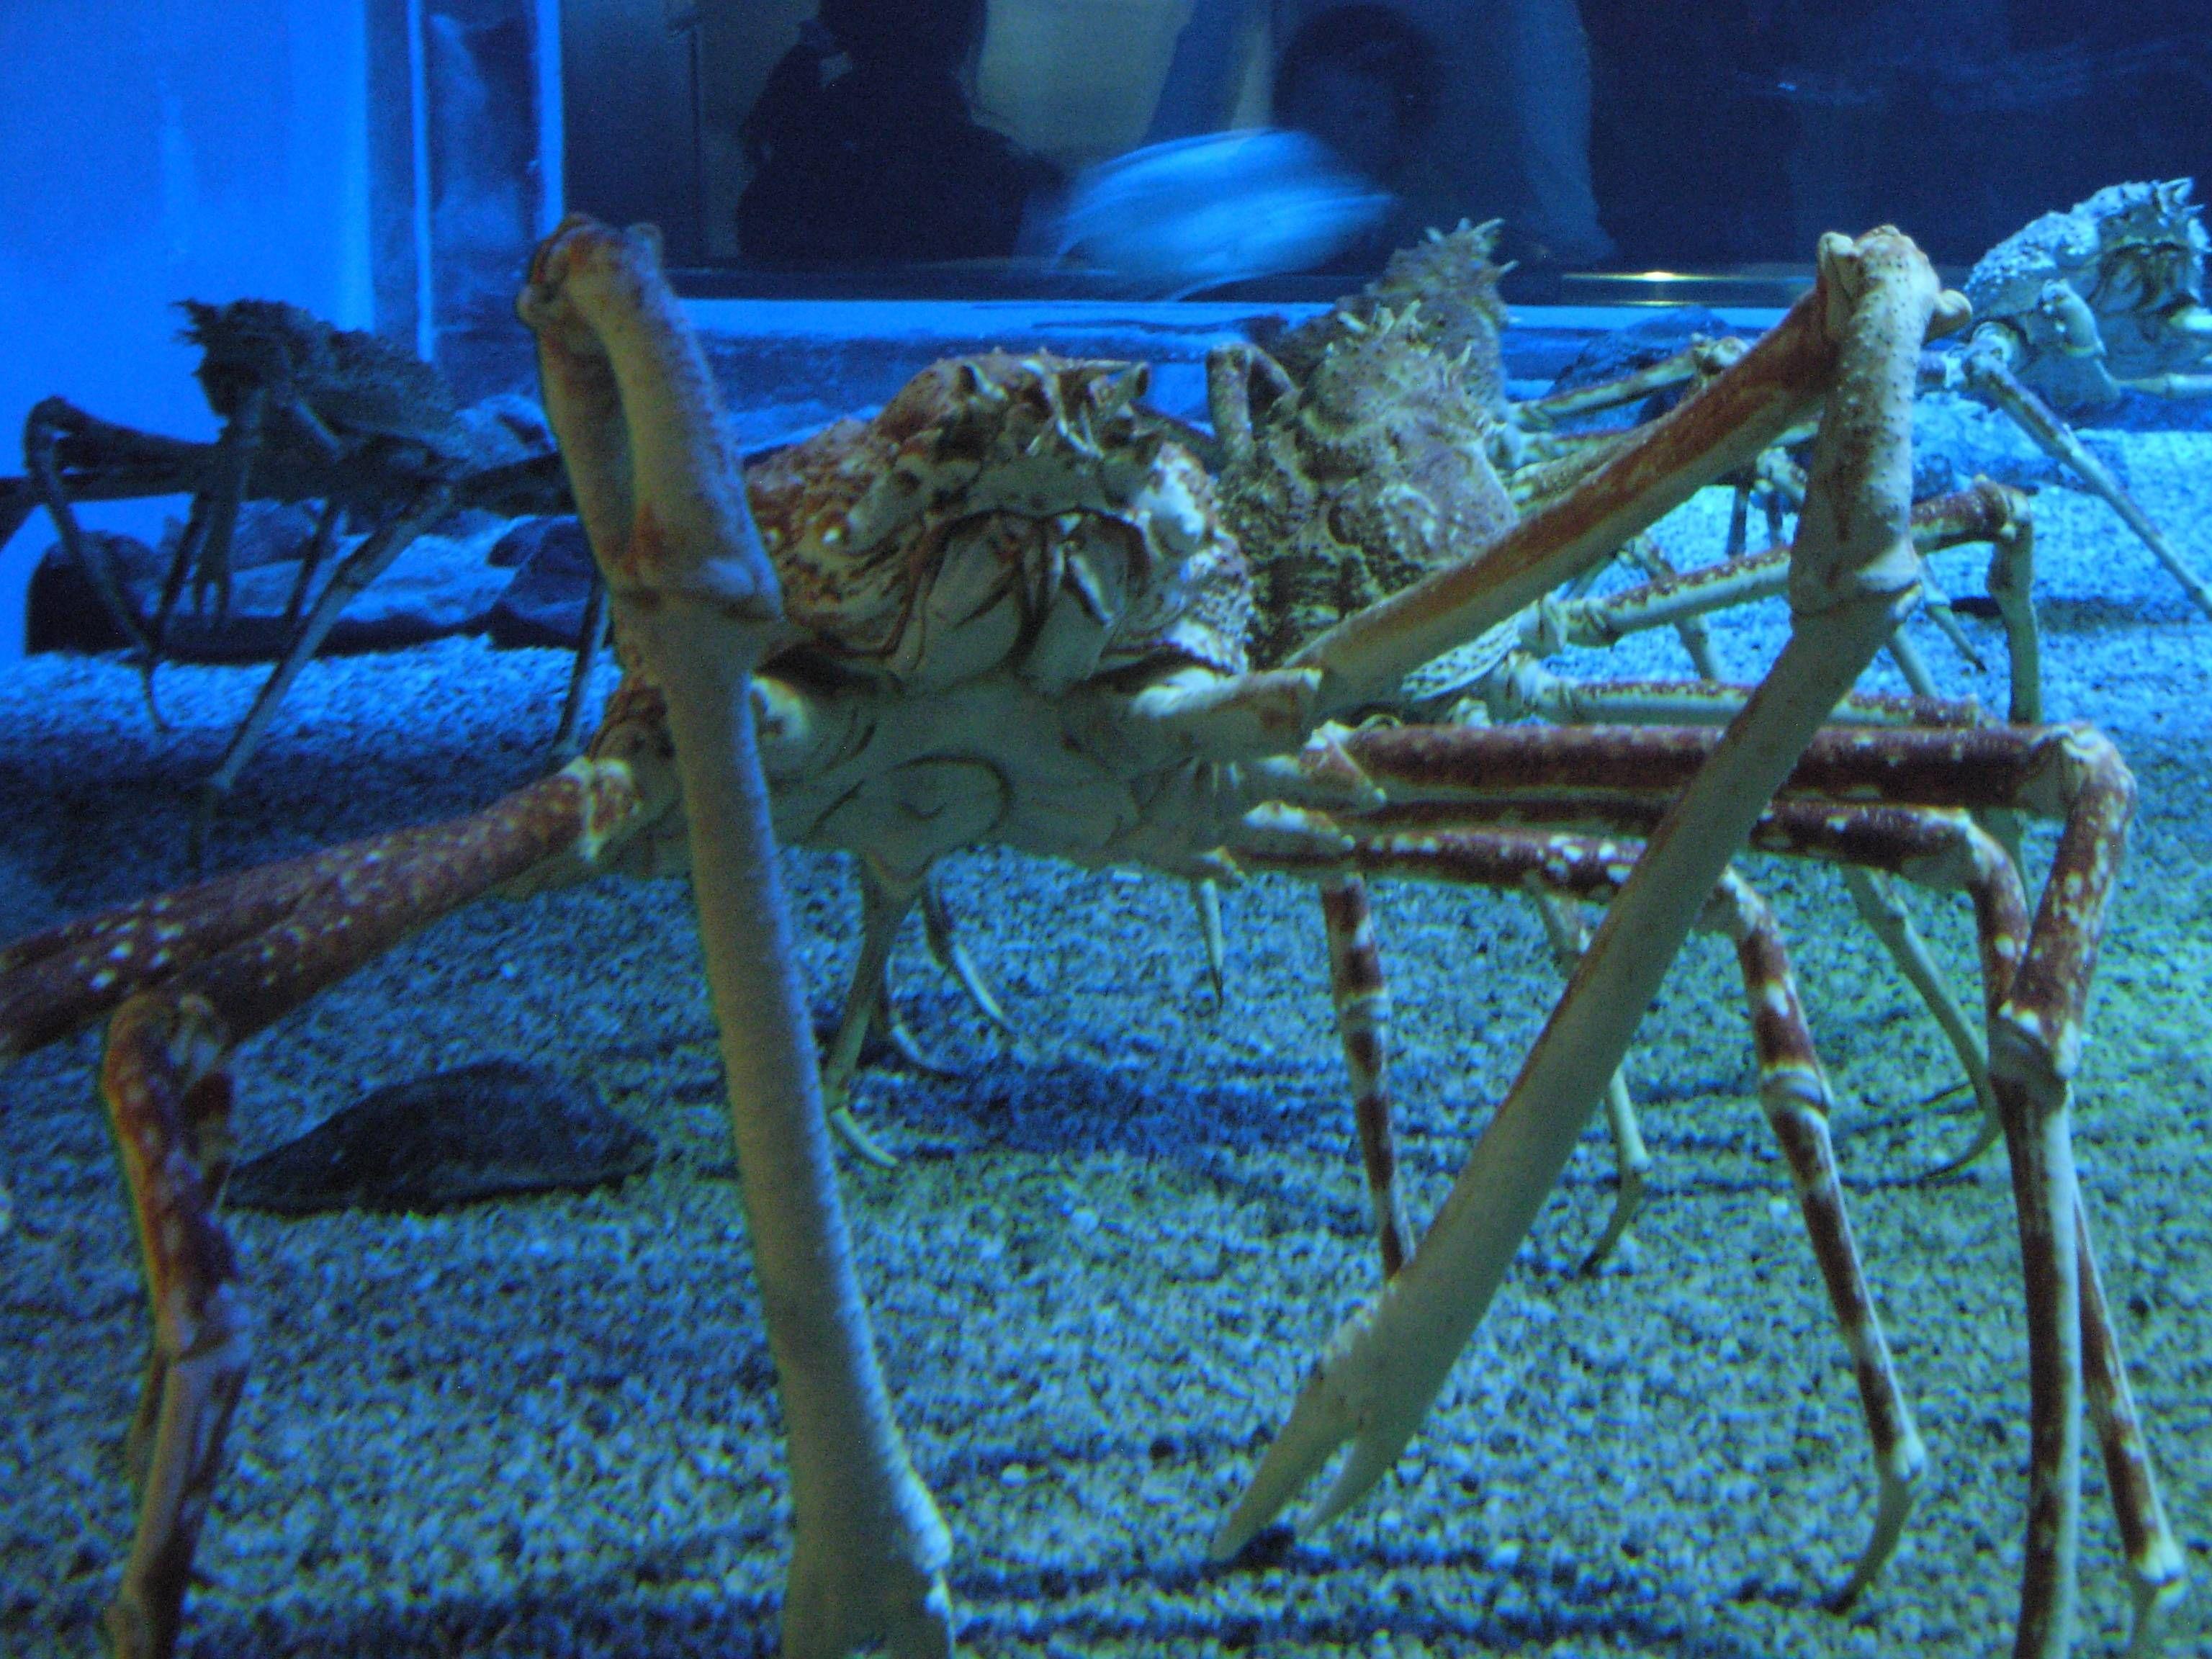 Best 25+ Giant sea spider ideas on Pinterest